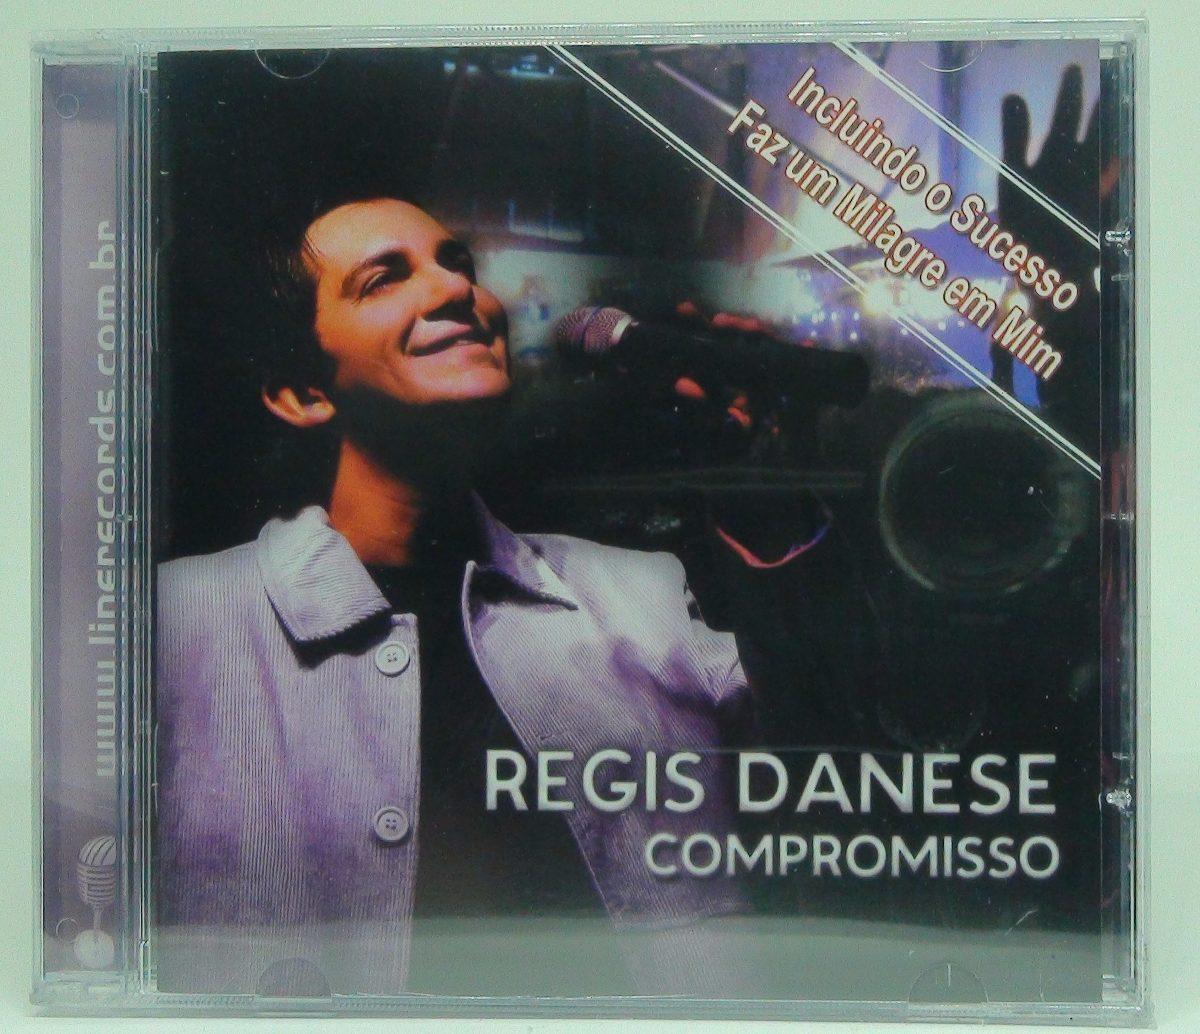 2009 ROBERTO BAIXAR THALLES CD